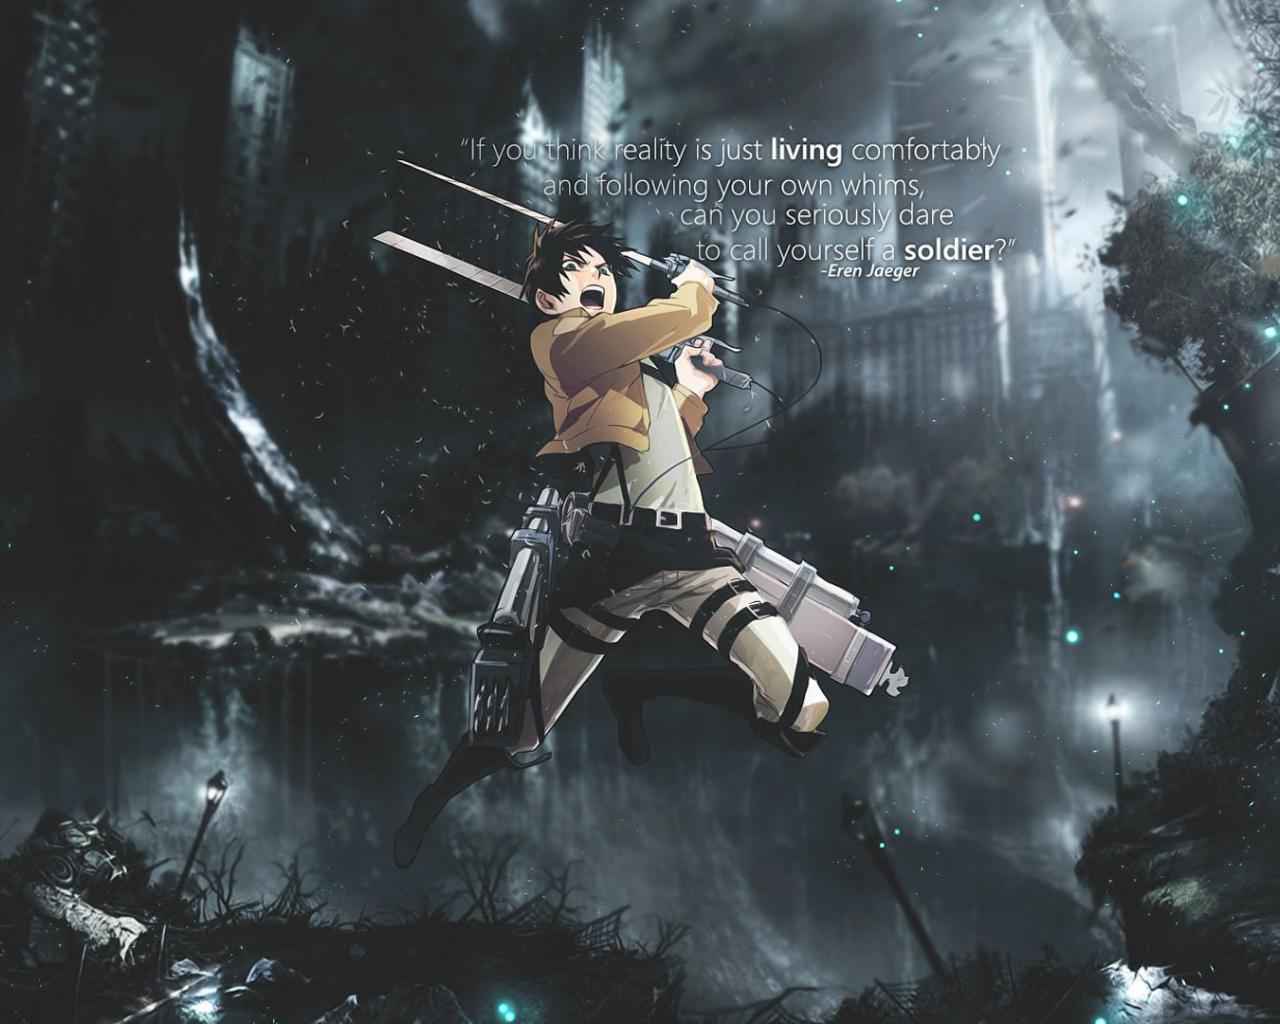 Free Download Eren Jaeger Attack On Titan Wallpaper 2340